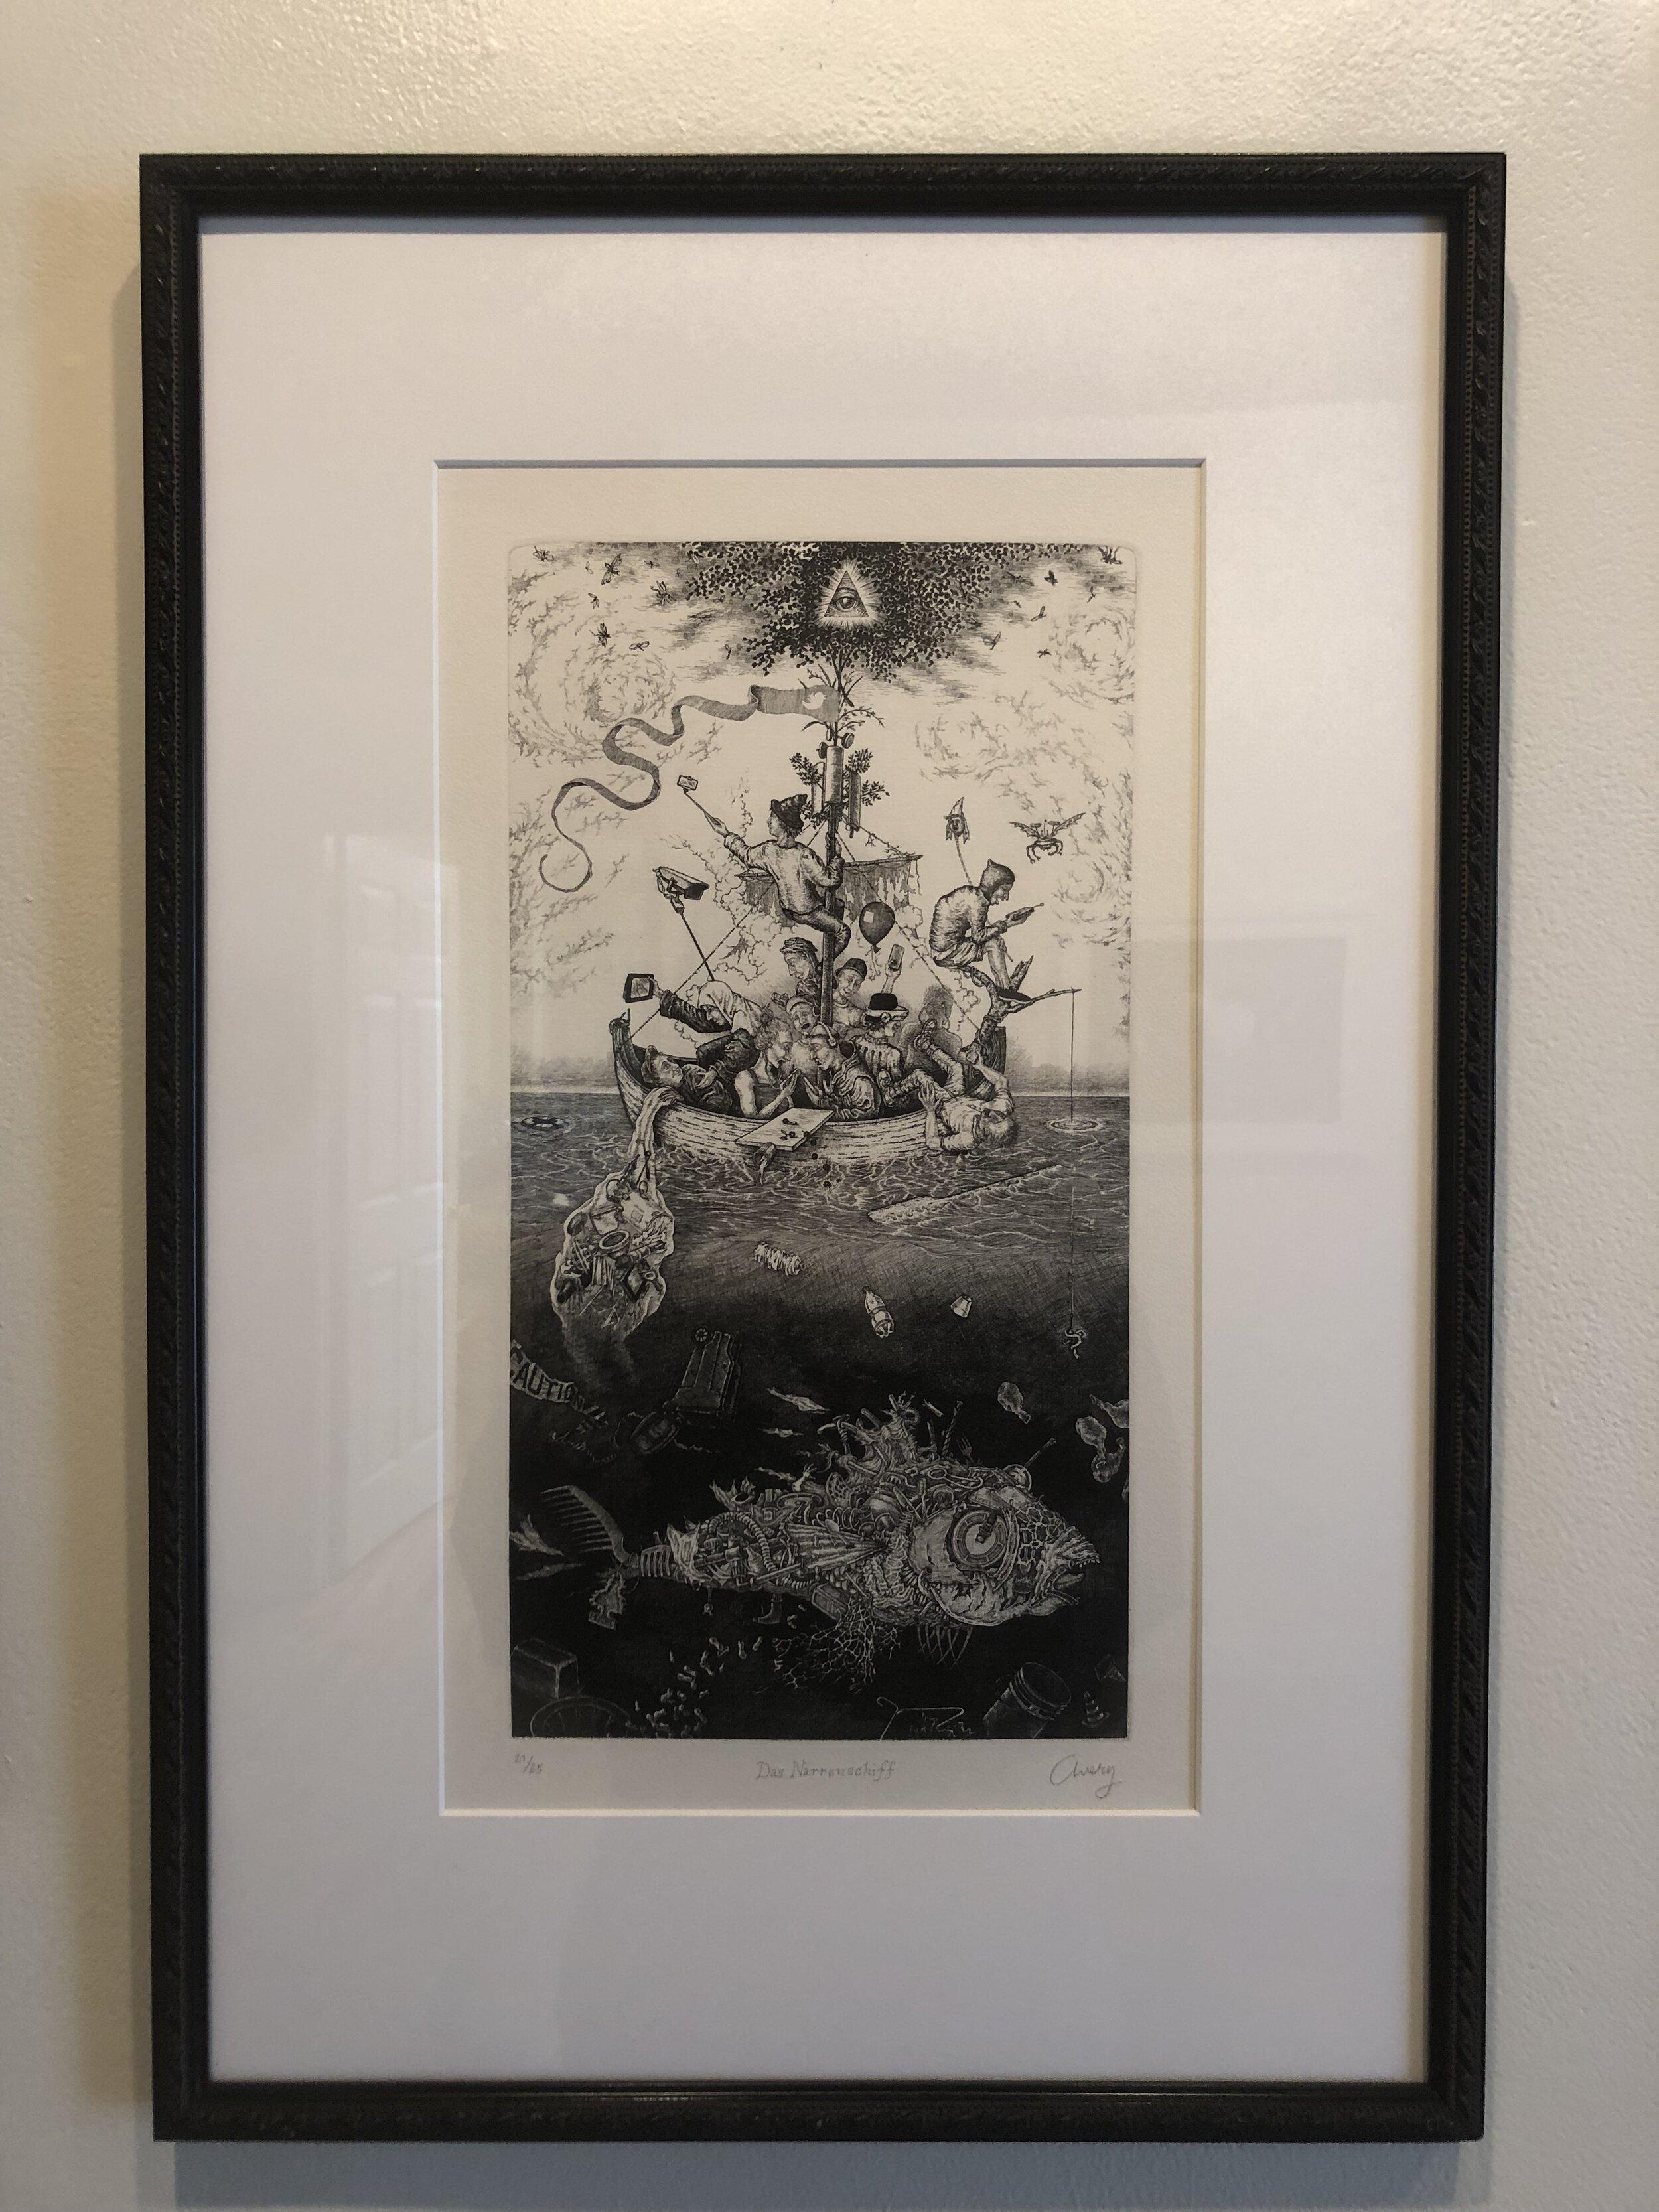 Das Narrenschiff by David Avery